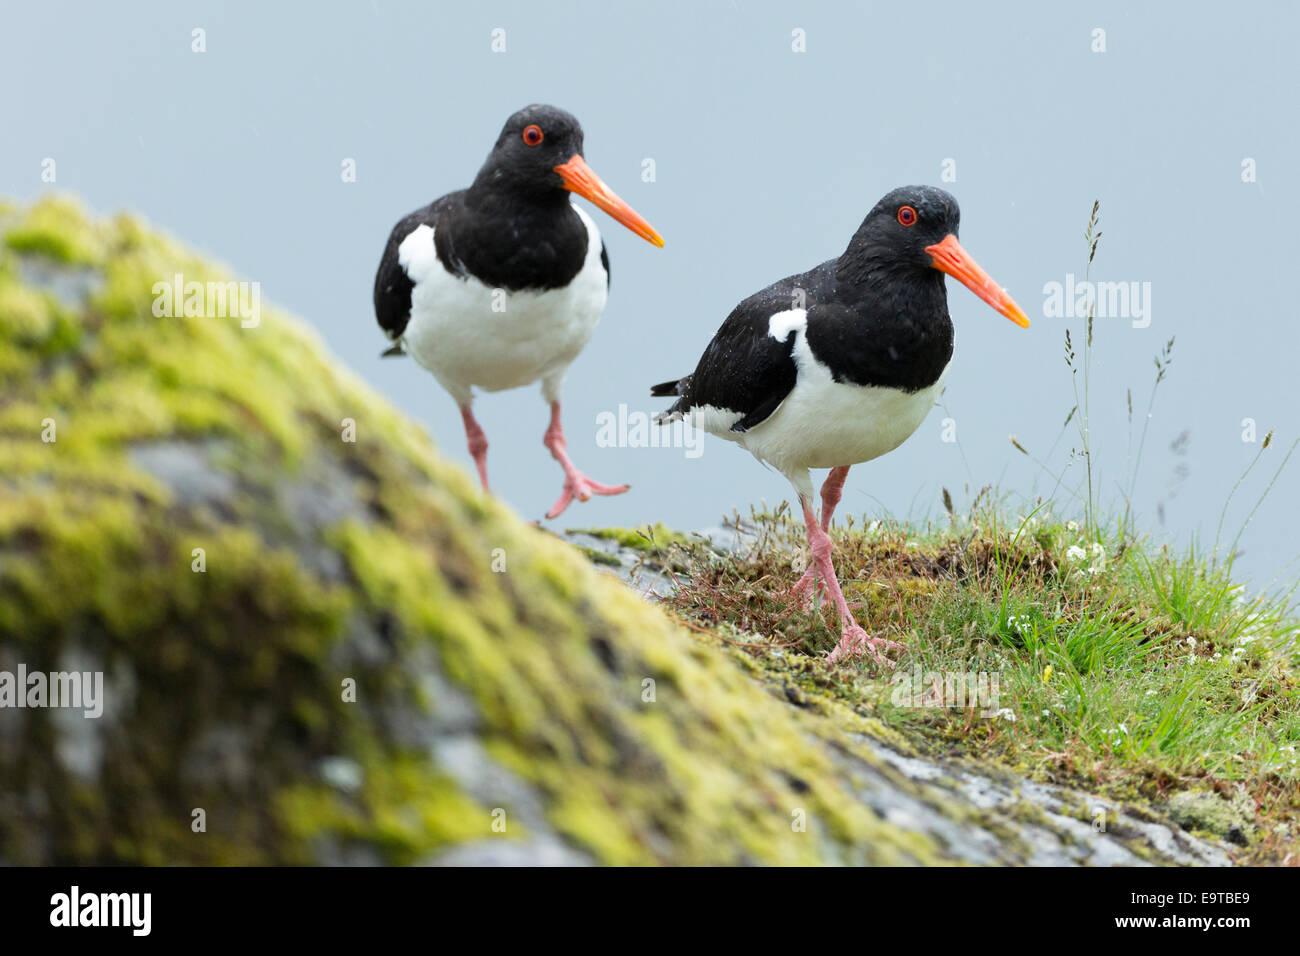 Pair of Oystercatchers, Haematopus ostralegus, black and white Oystercatcher wading birds with long orange beaks Stock Photo